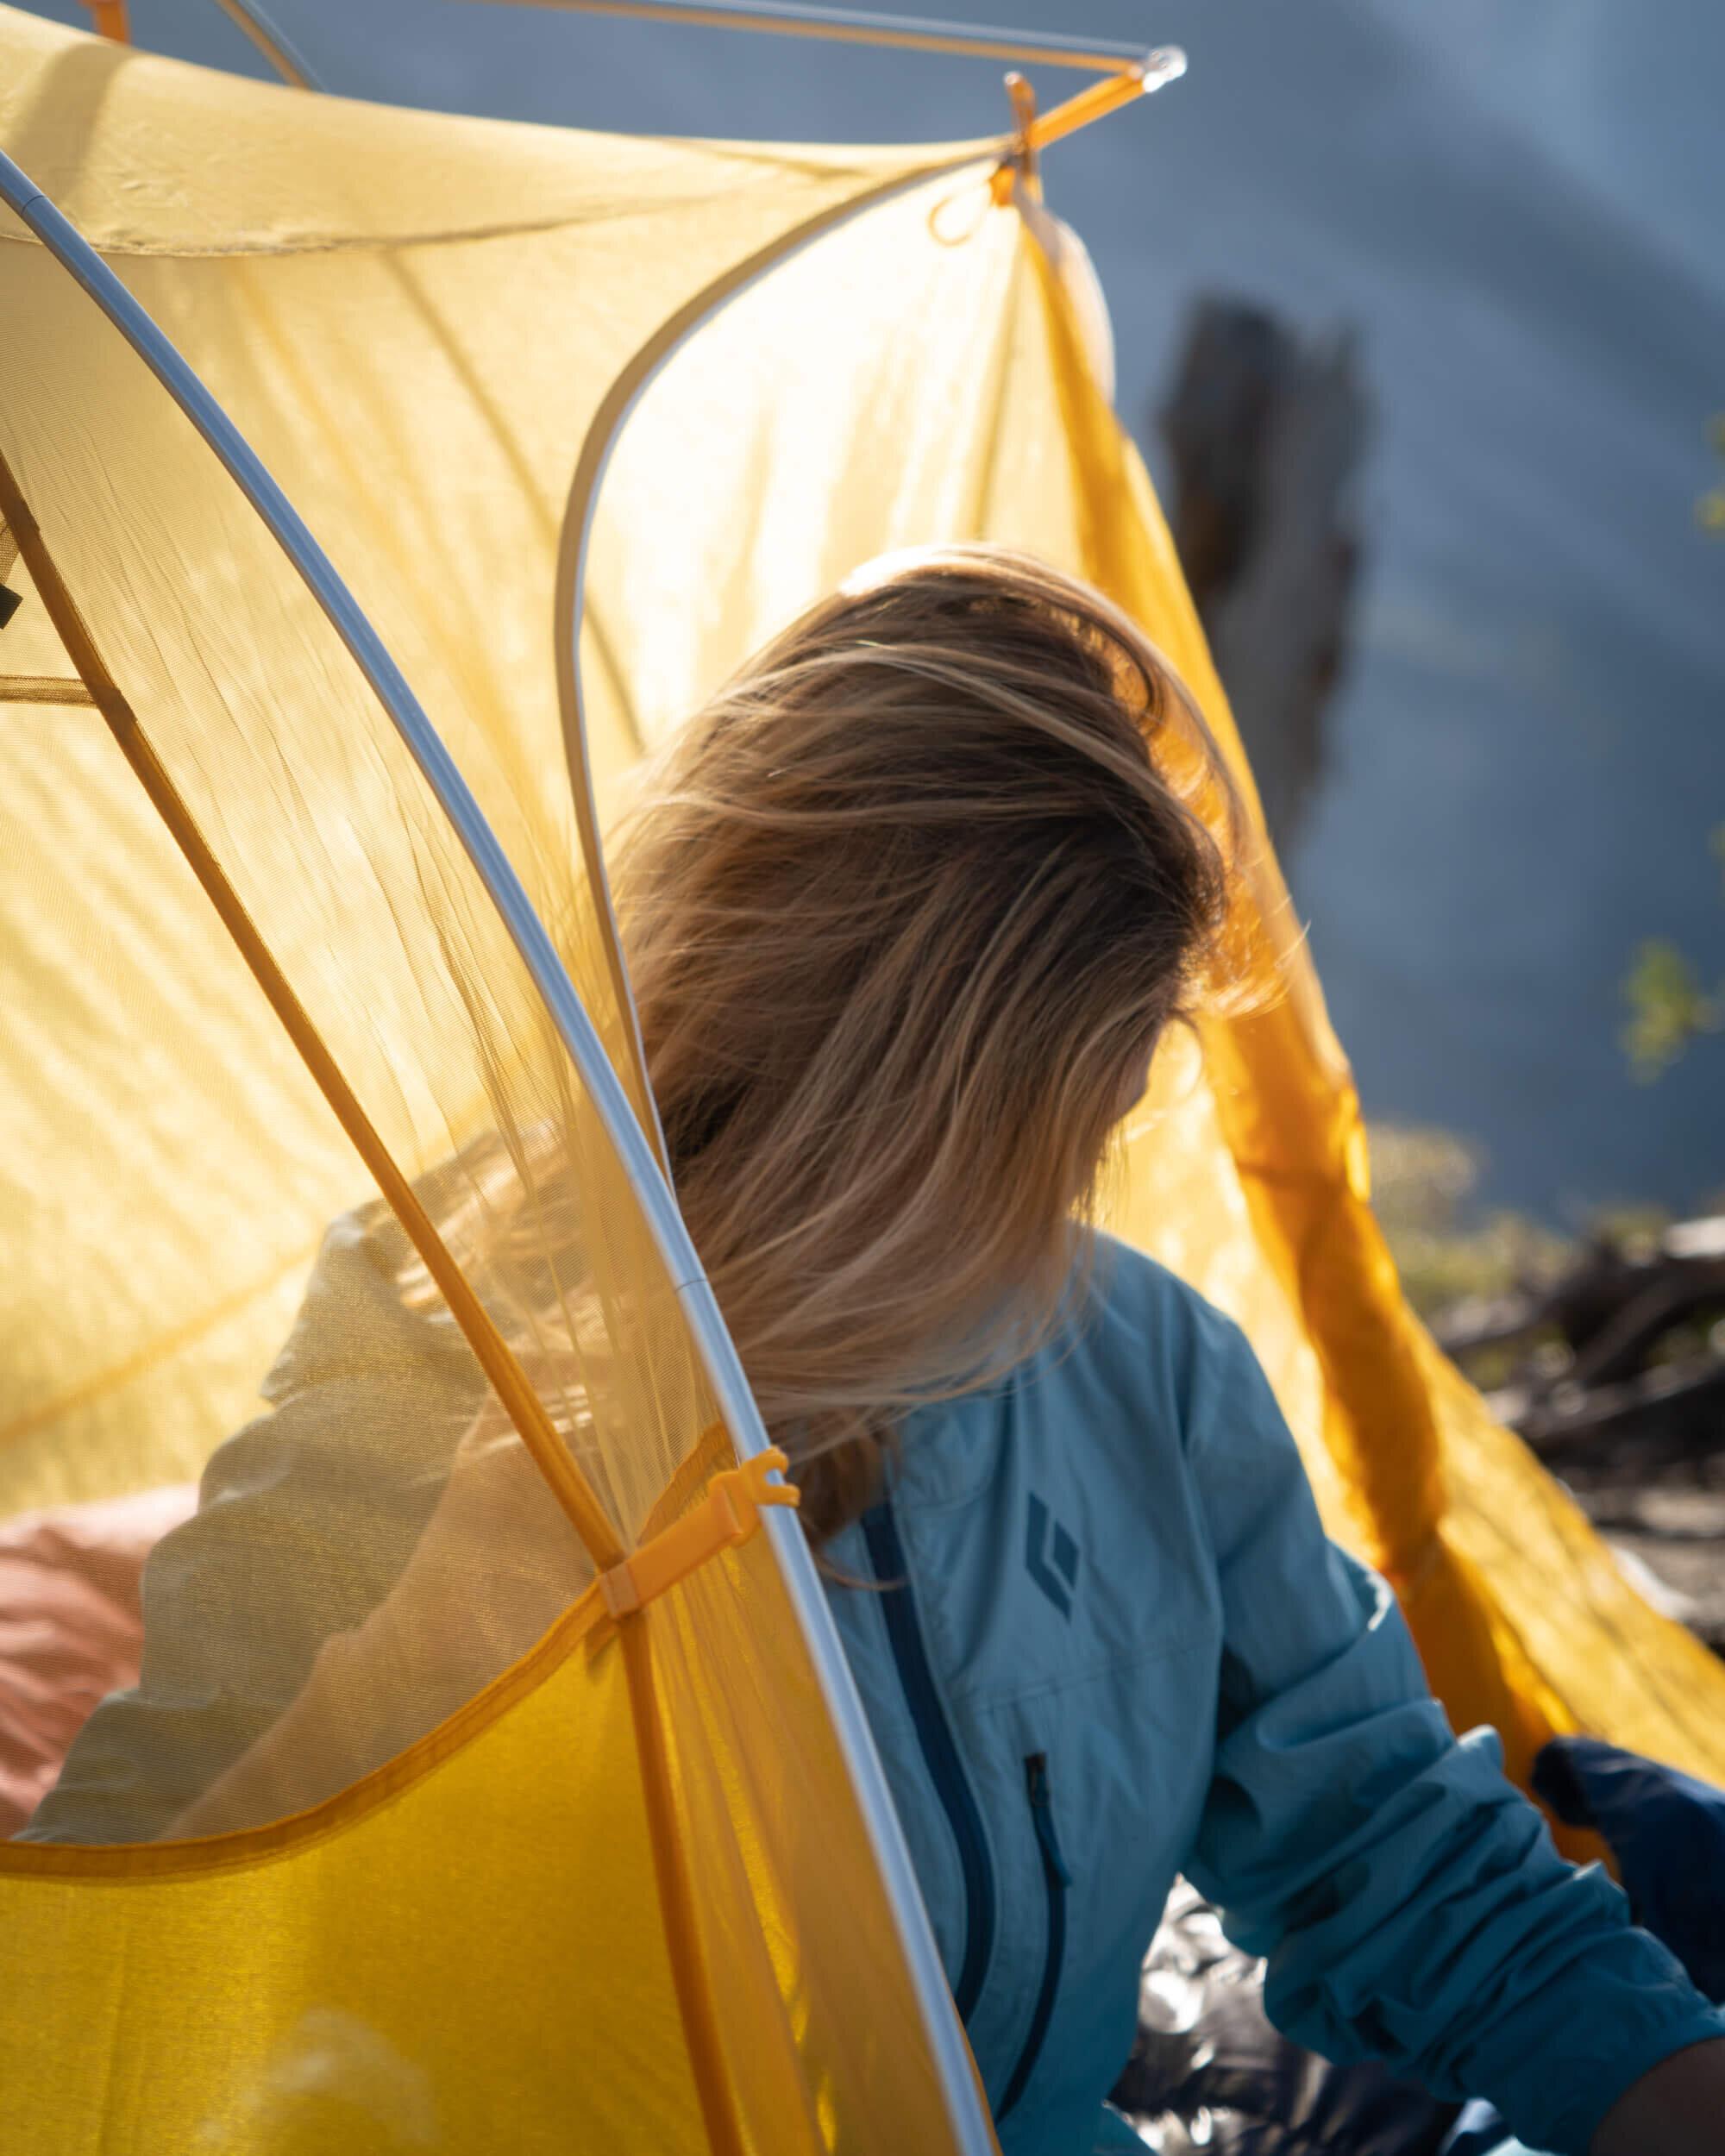 Camping in Yosemite National Park.